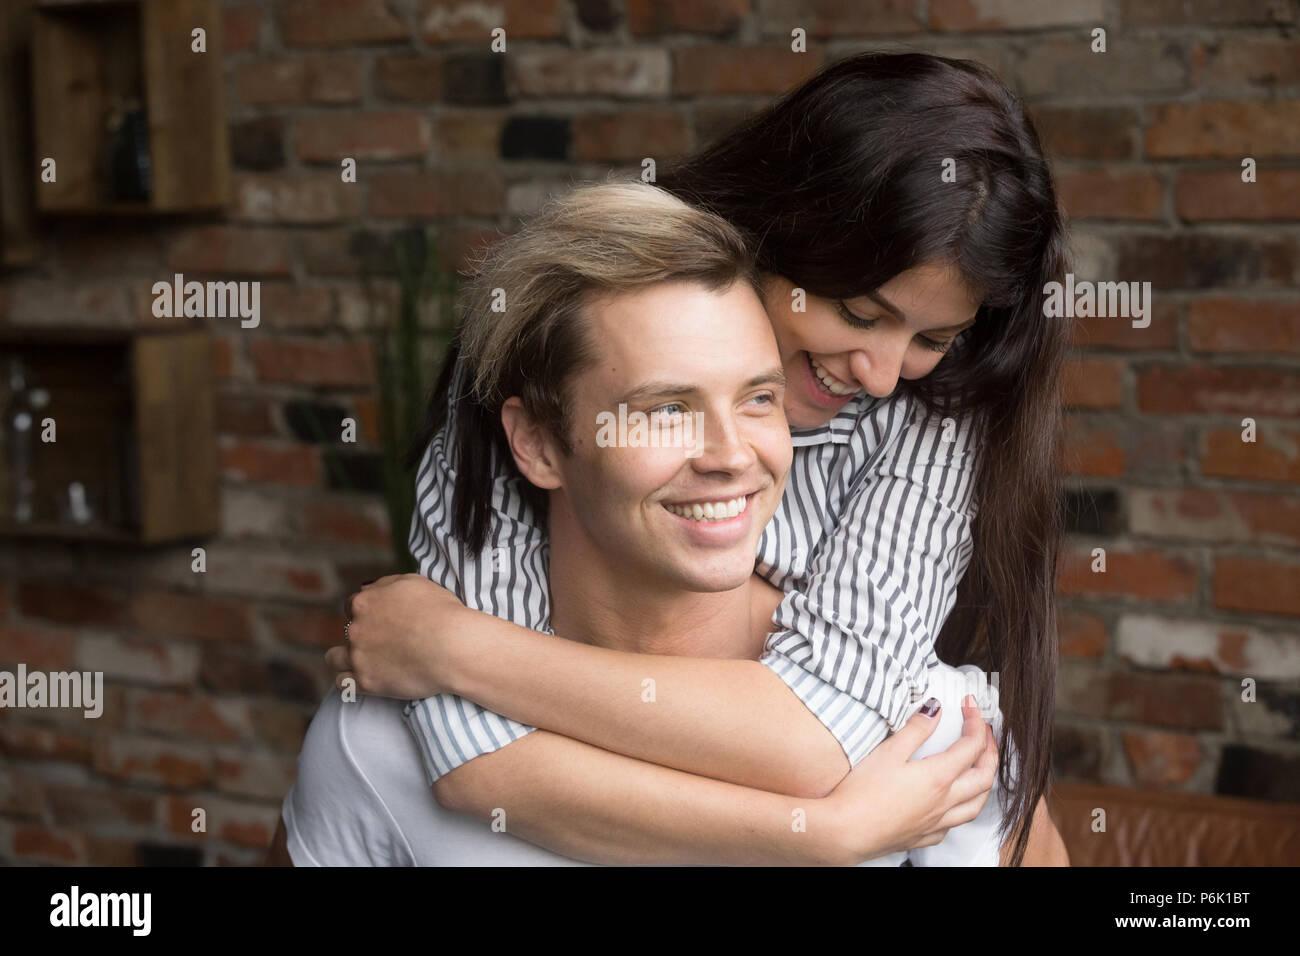 Happy girlfriend piggyback smiling boyfriend having fun at home - Stock Image